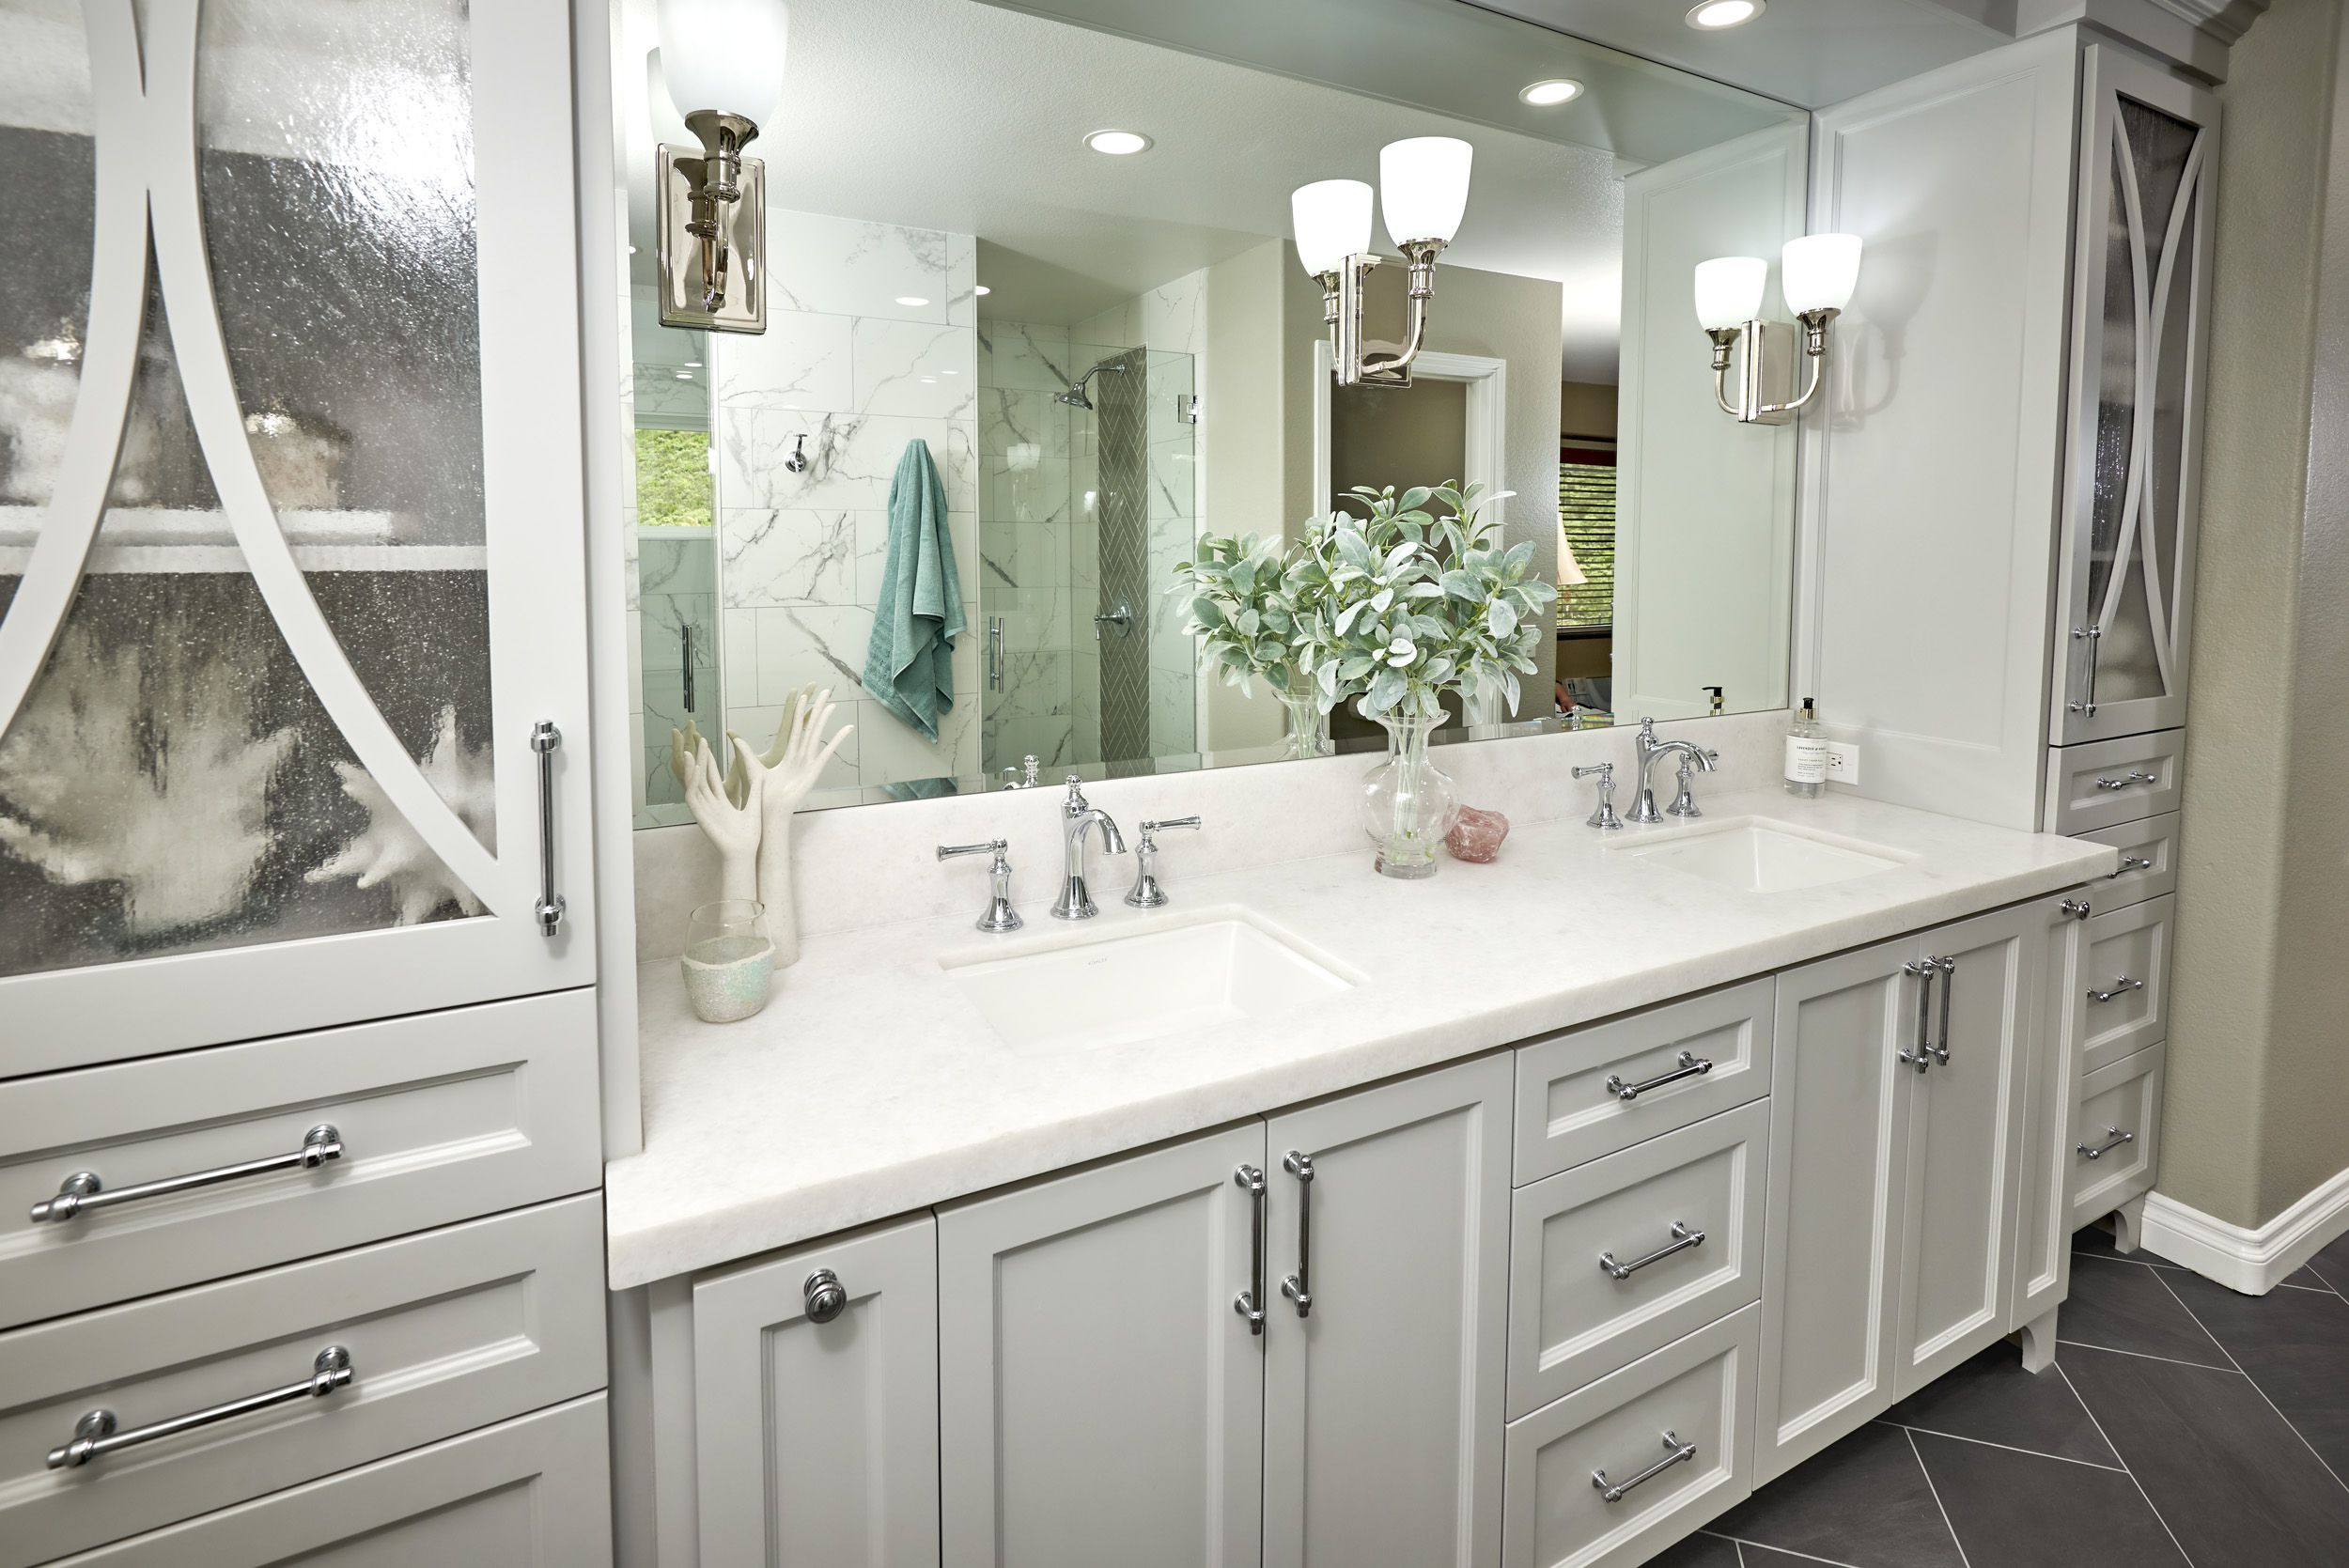 Create A Spa Like Bathroom With Soft Gray Walls A Clawfoot Tub Striking Herringbone F White Wood Kitchens White Laminate Flooring Gray Wood Laminate Flooring